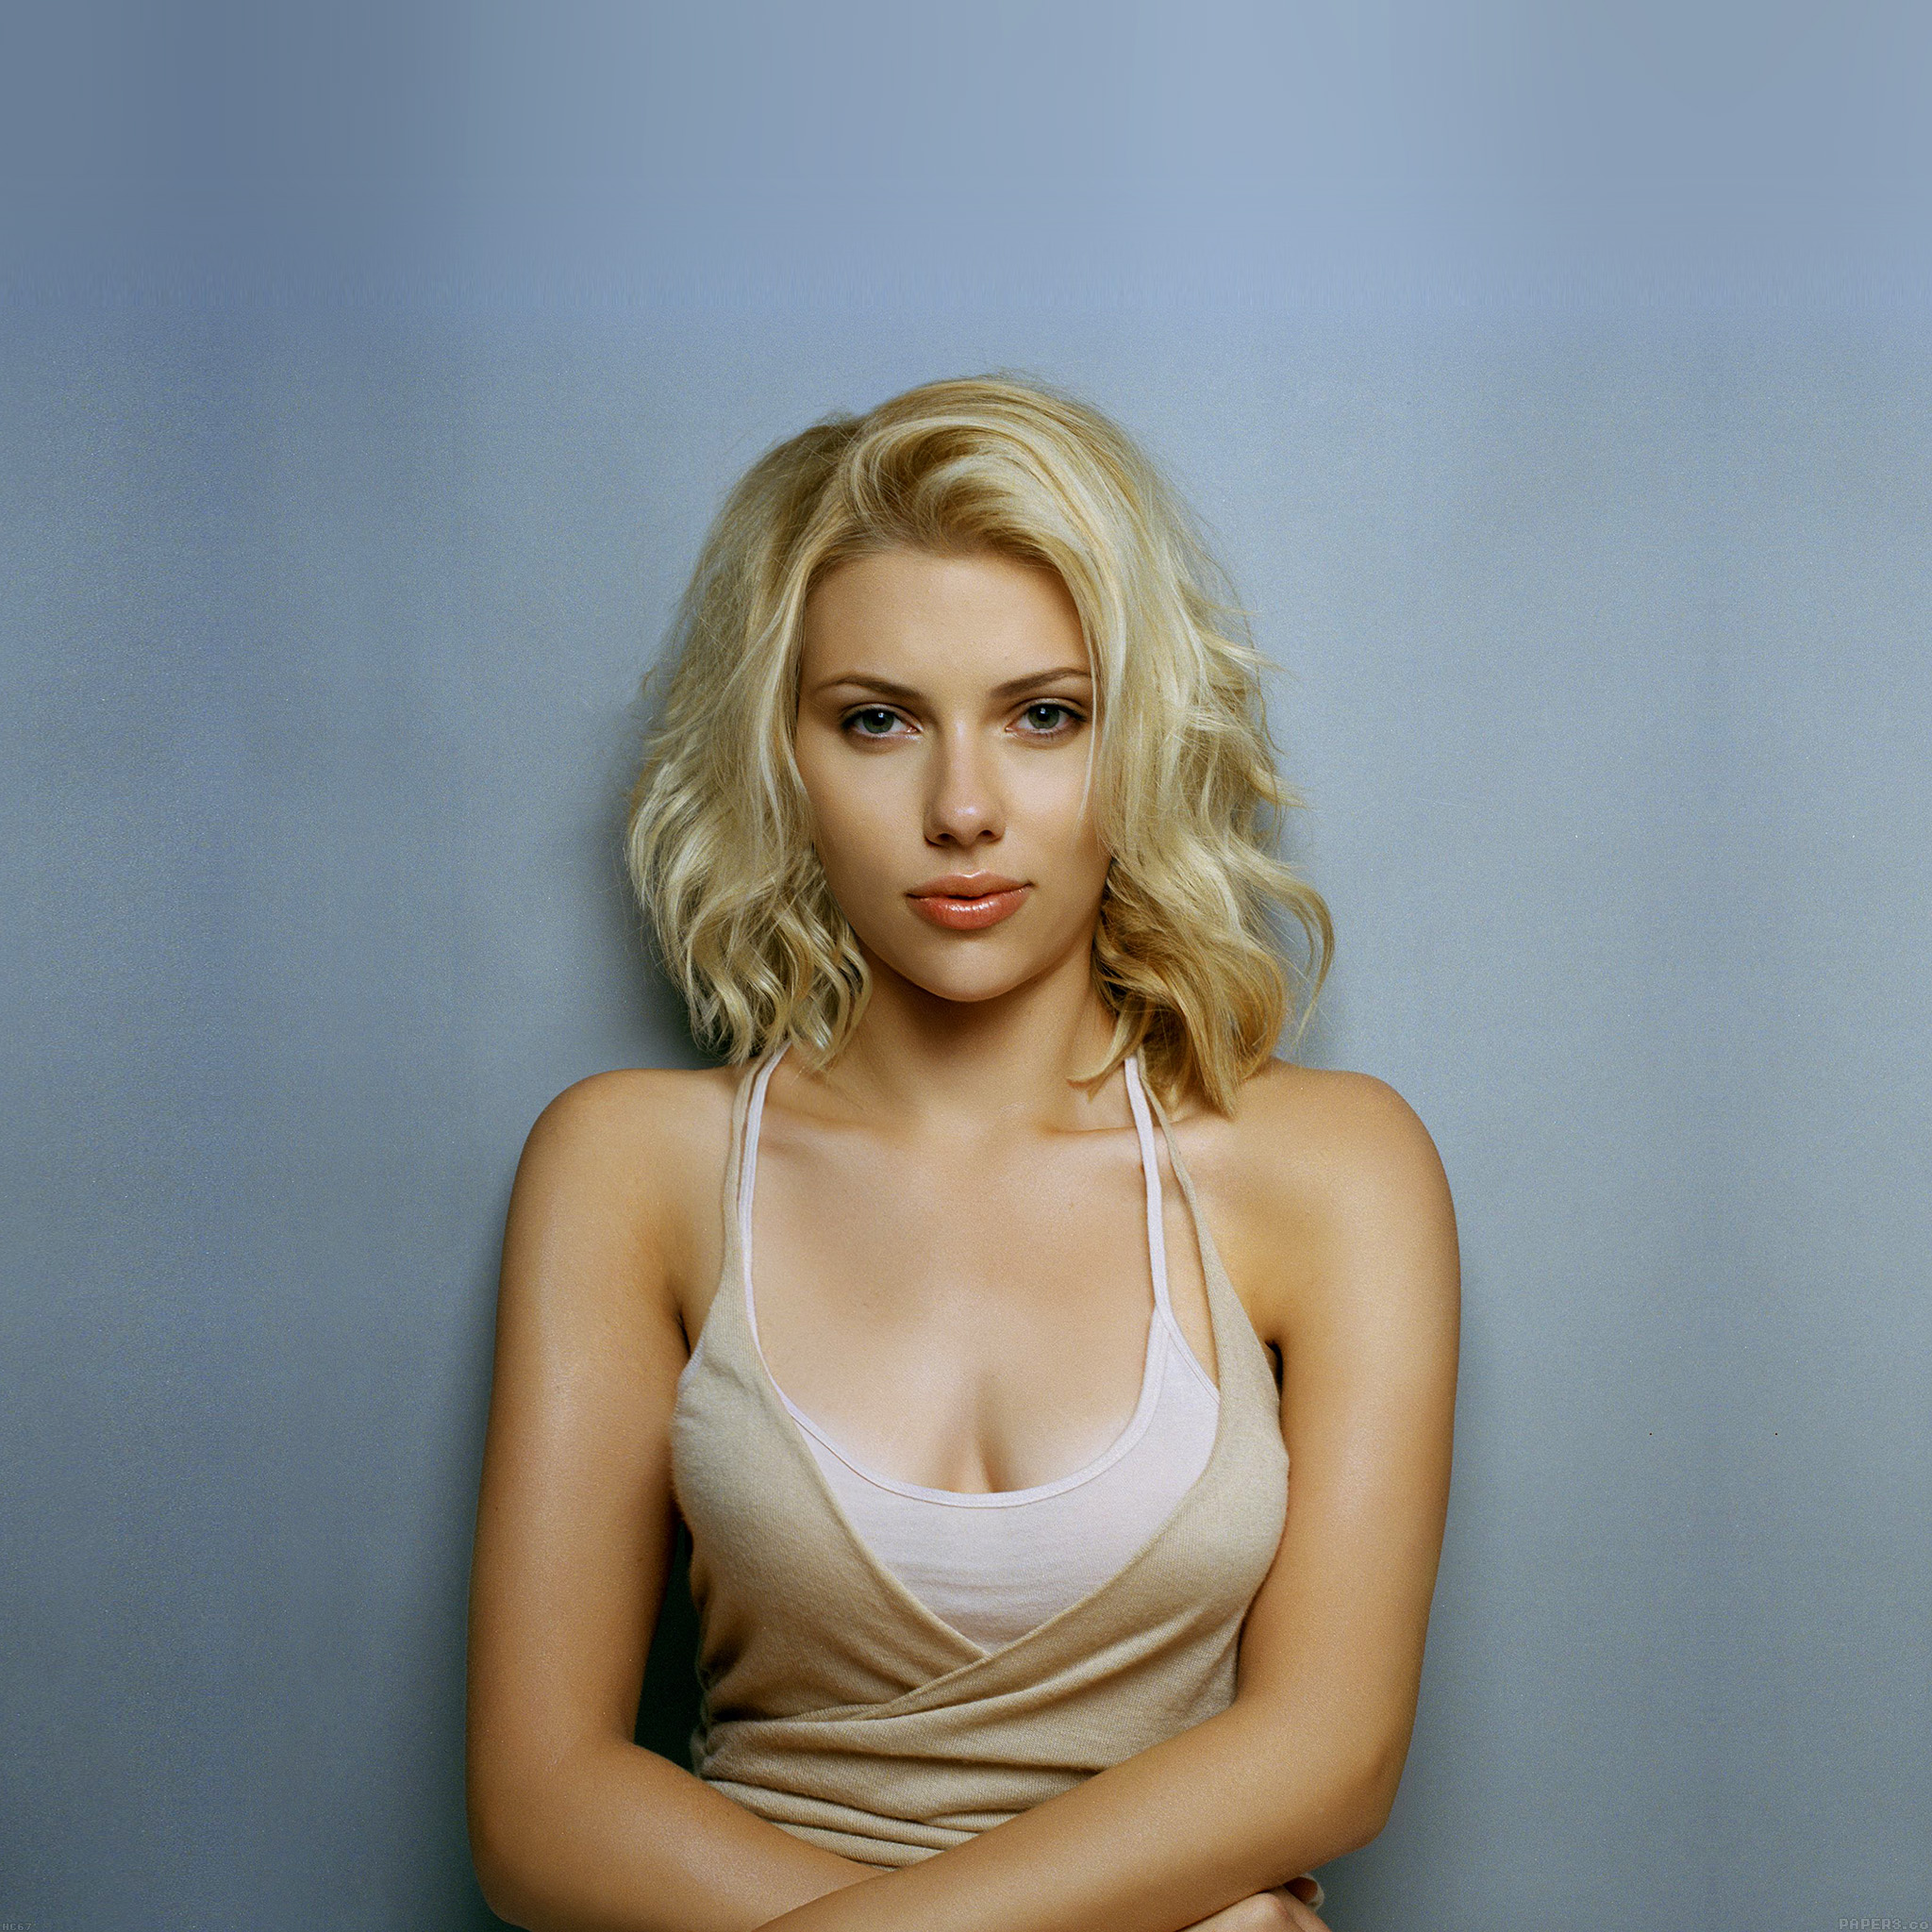 Hc67-scarlett-johansson-sexy-dress-actress